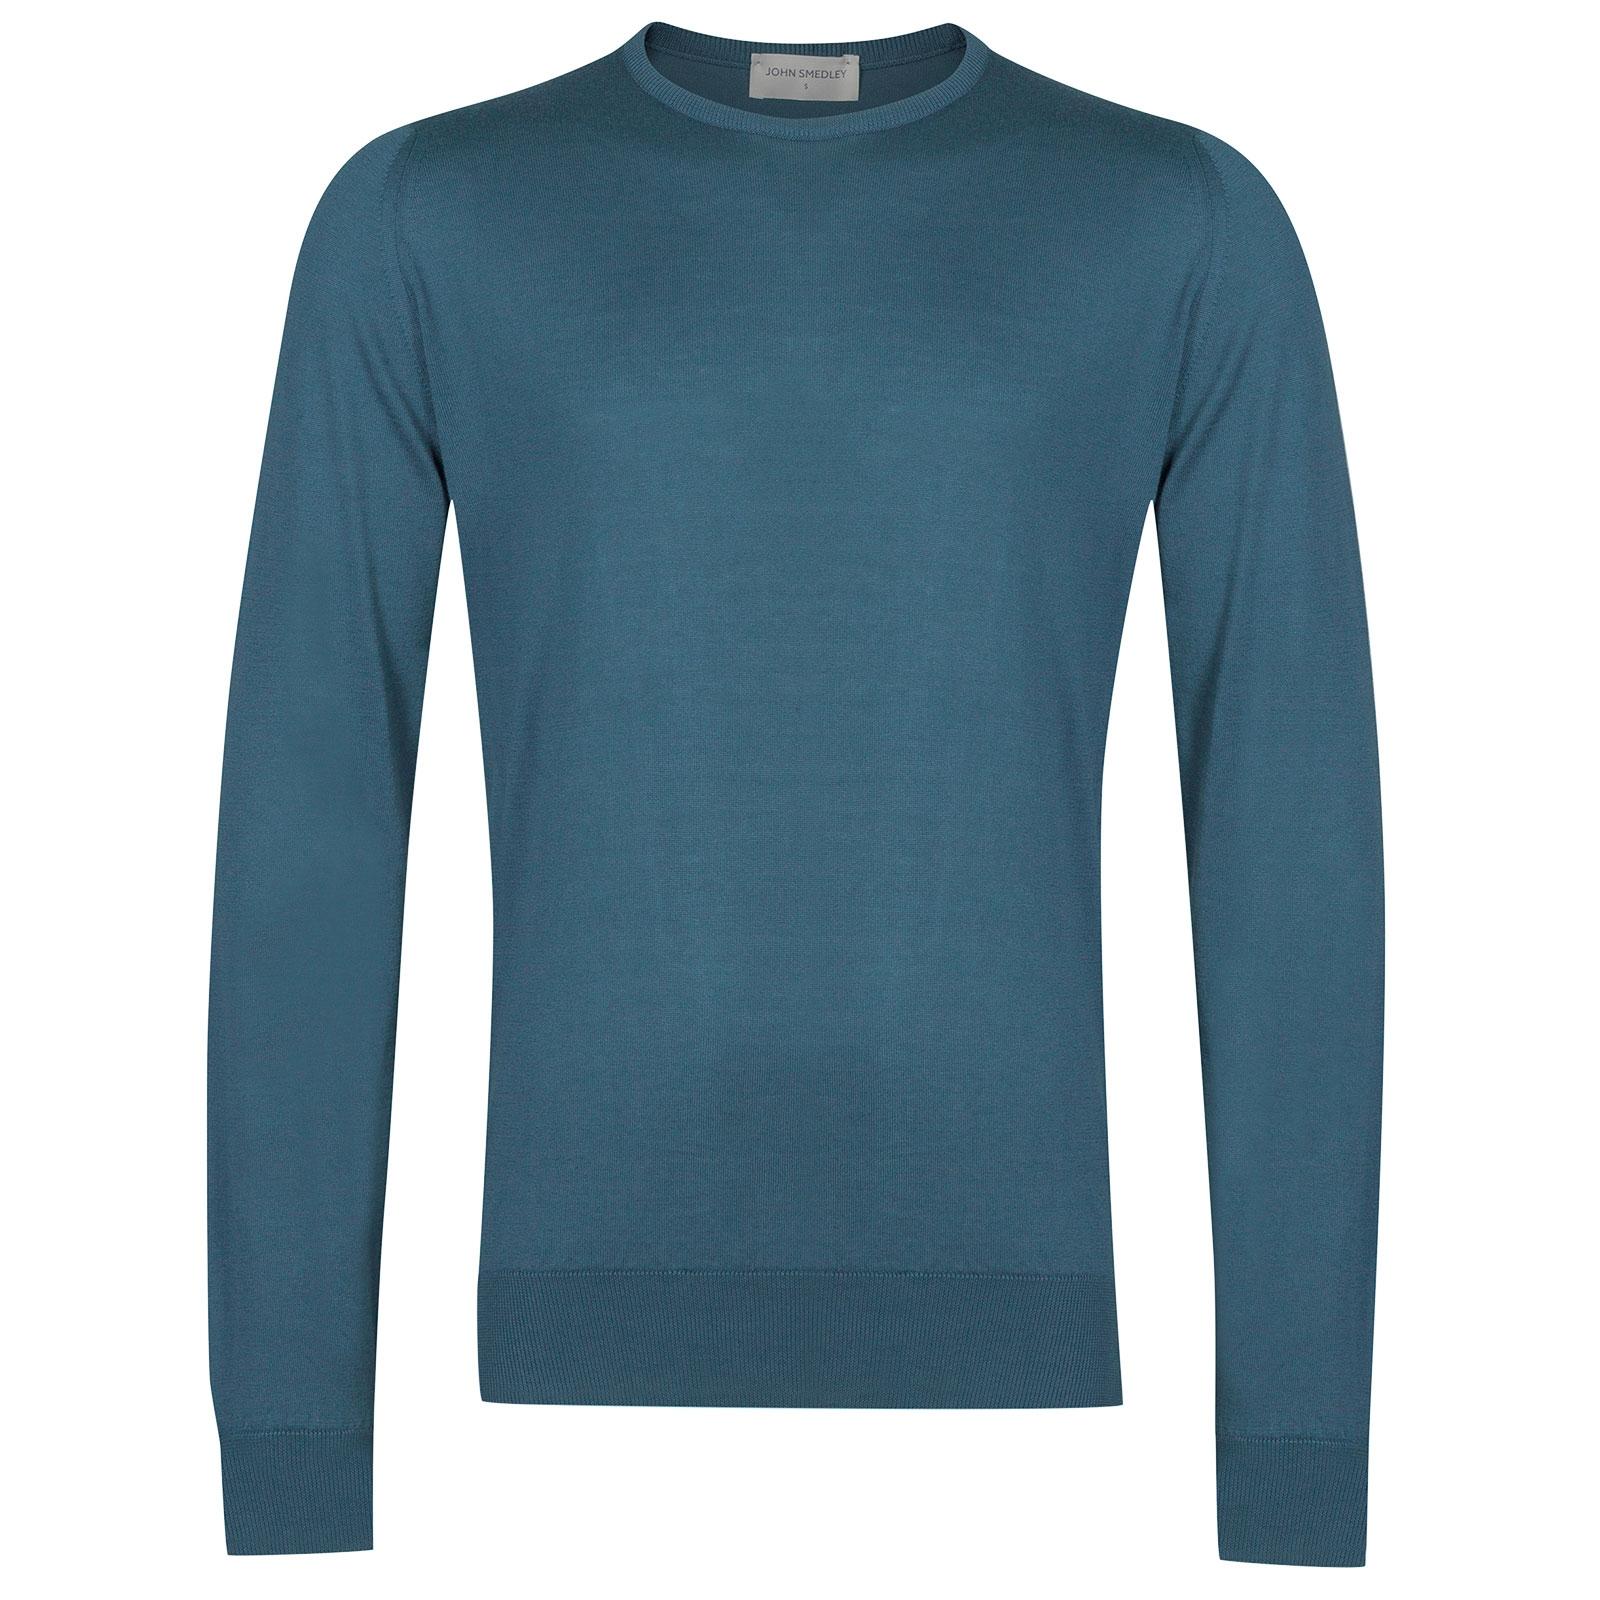 John Smedley HatfieldSea Island Cotton Pullover in Bias Blue-XL